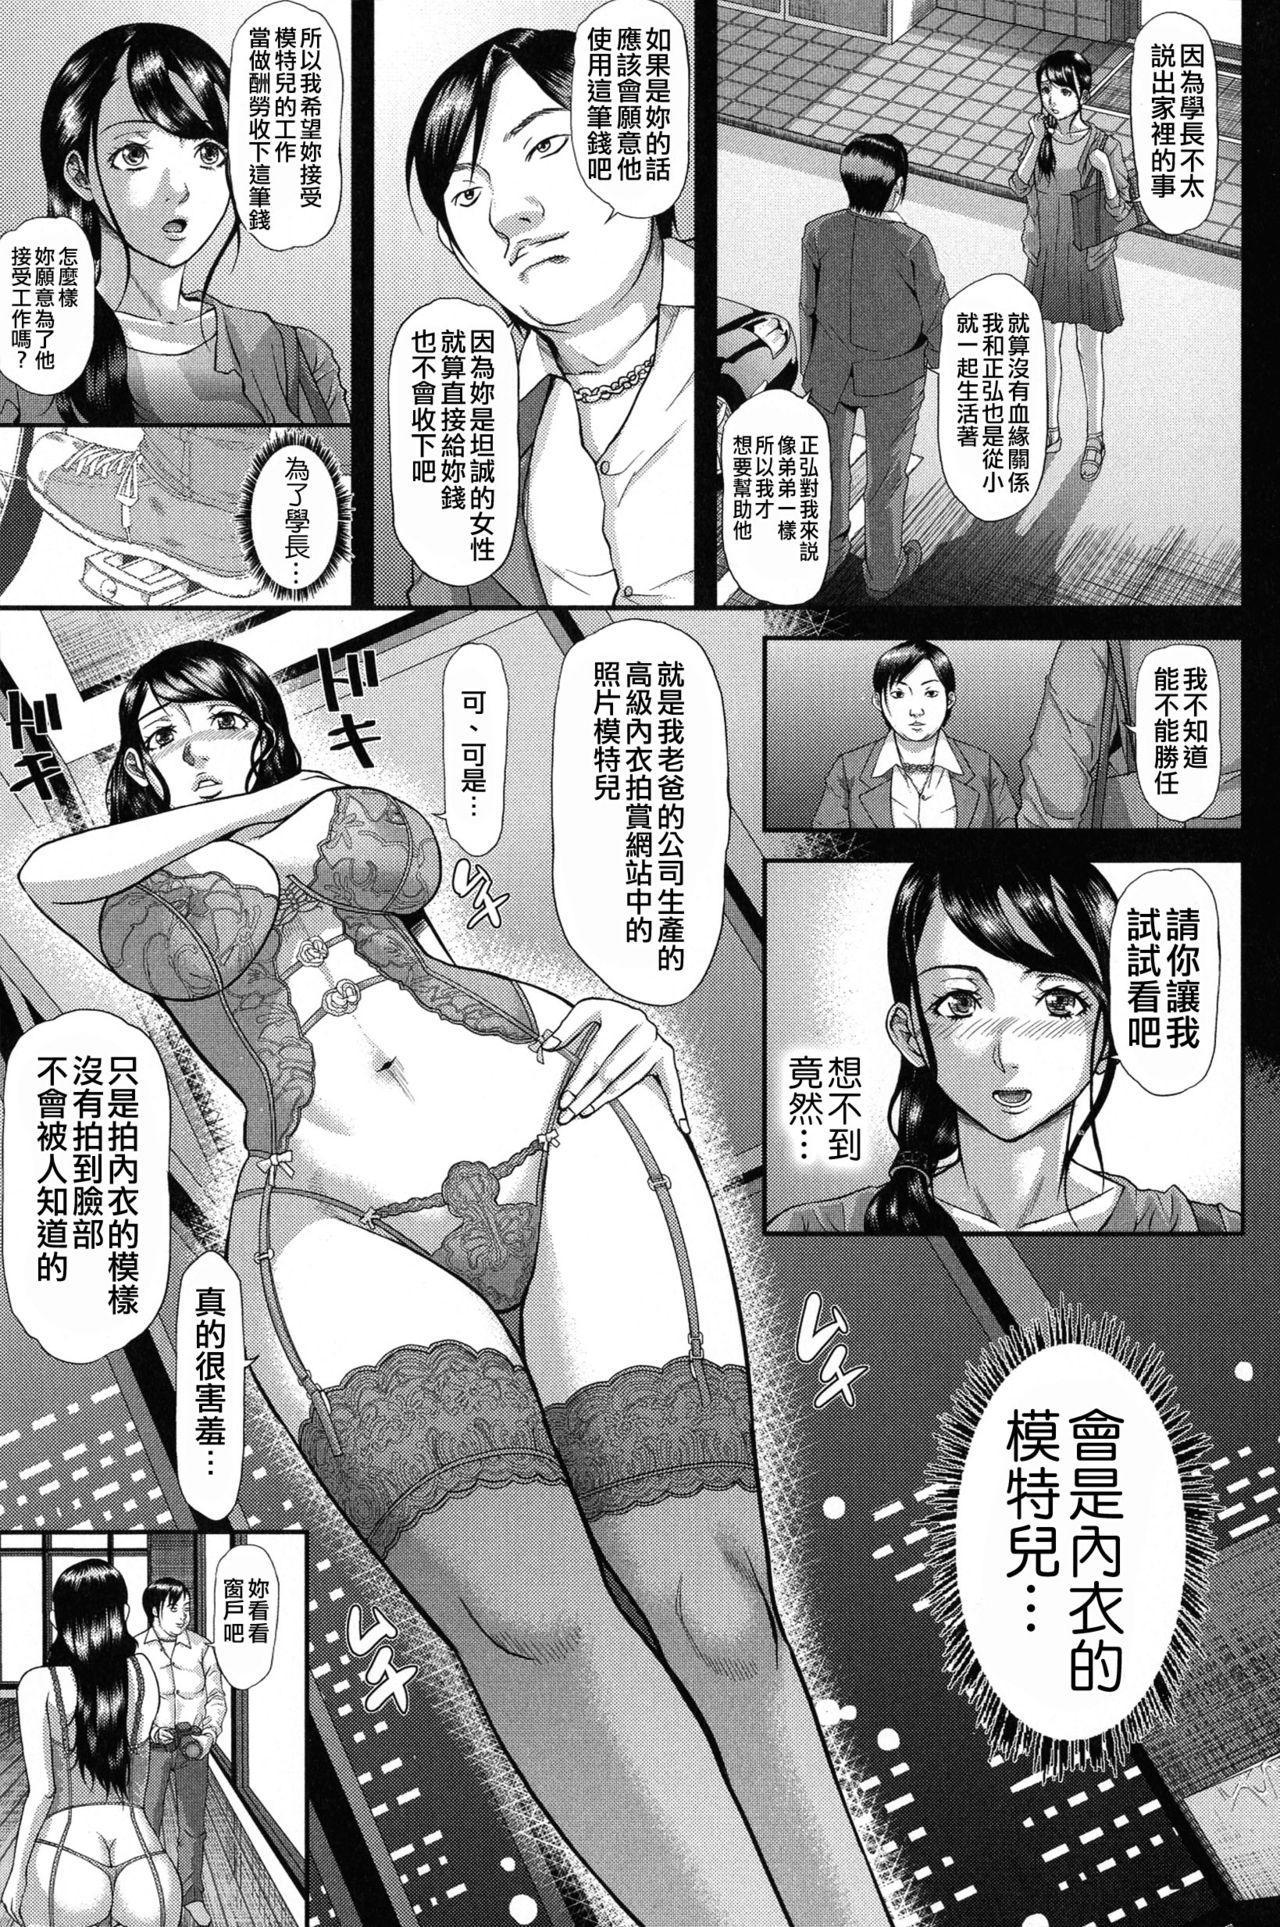 [Honebuto Danshaku] Innou Kaizou Program ~Oyako Zecchou Cult Ochi~ [Chinese]【不想记名重嵌--高质量图源】 109